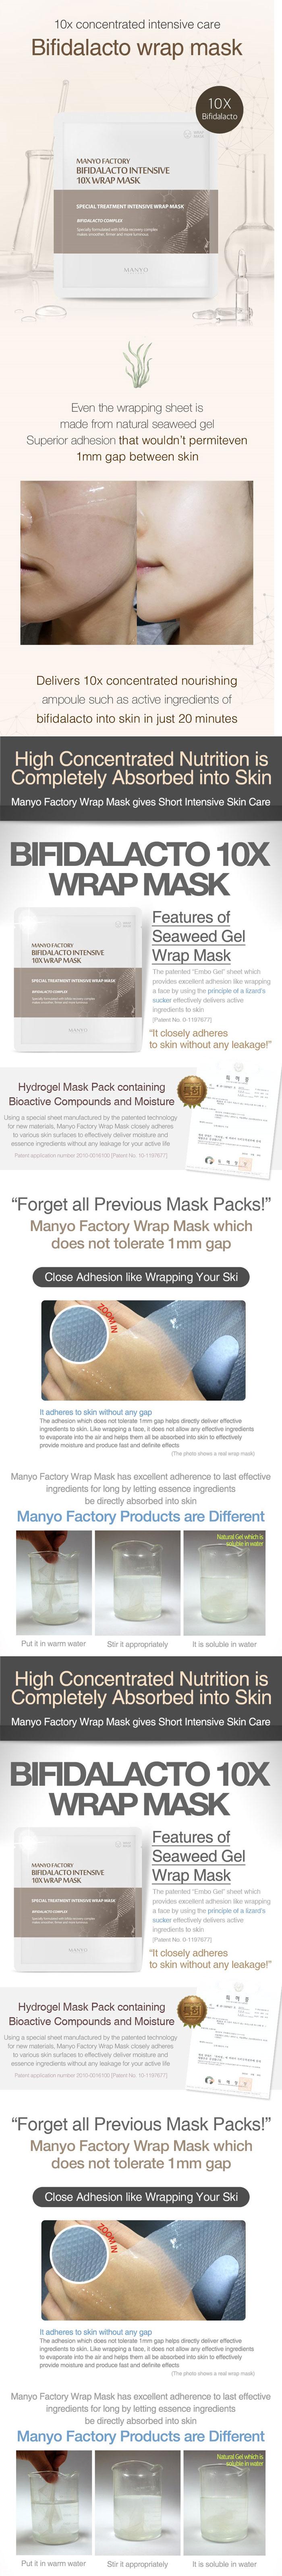 Manyo Factory Bifidalacto Intensive 10X Wrap Mask 30g malaysia singapore indonesia